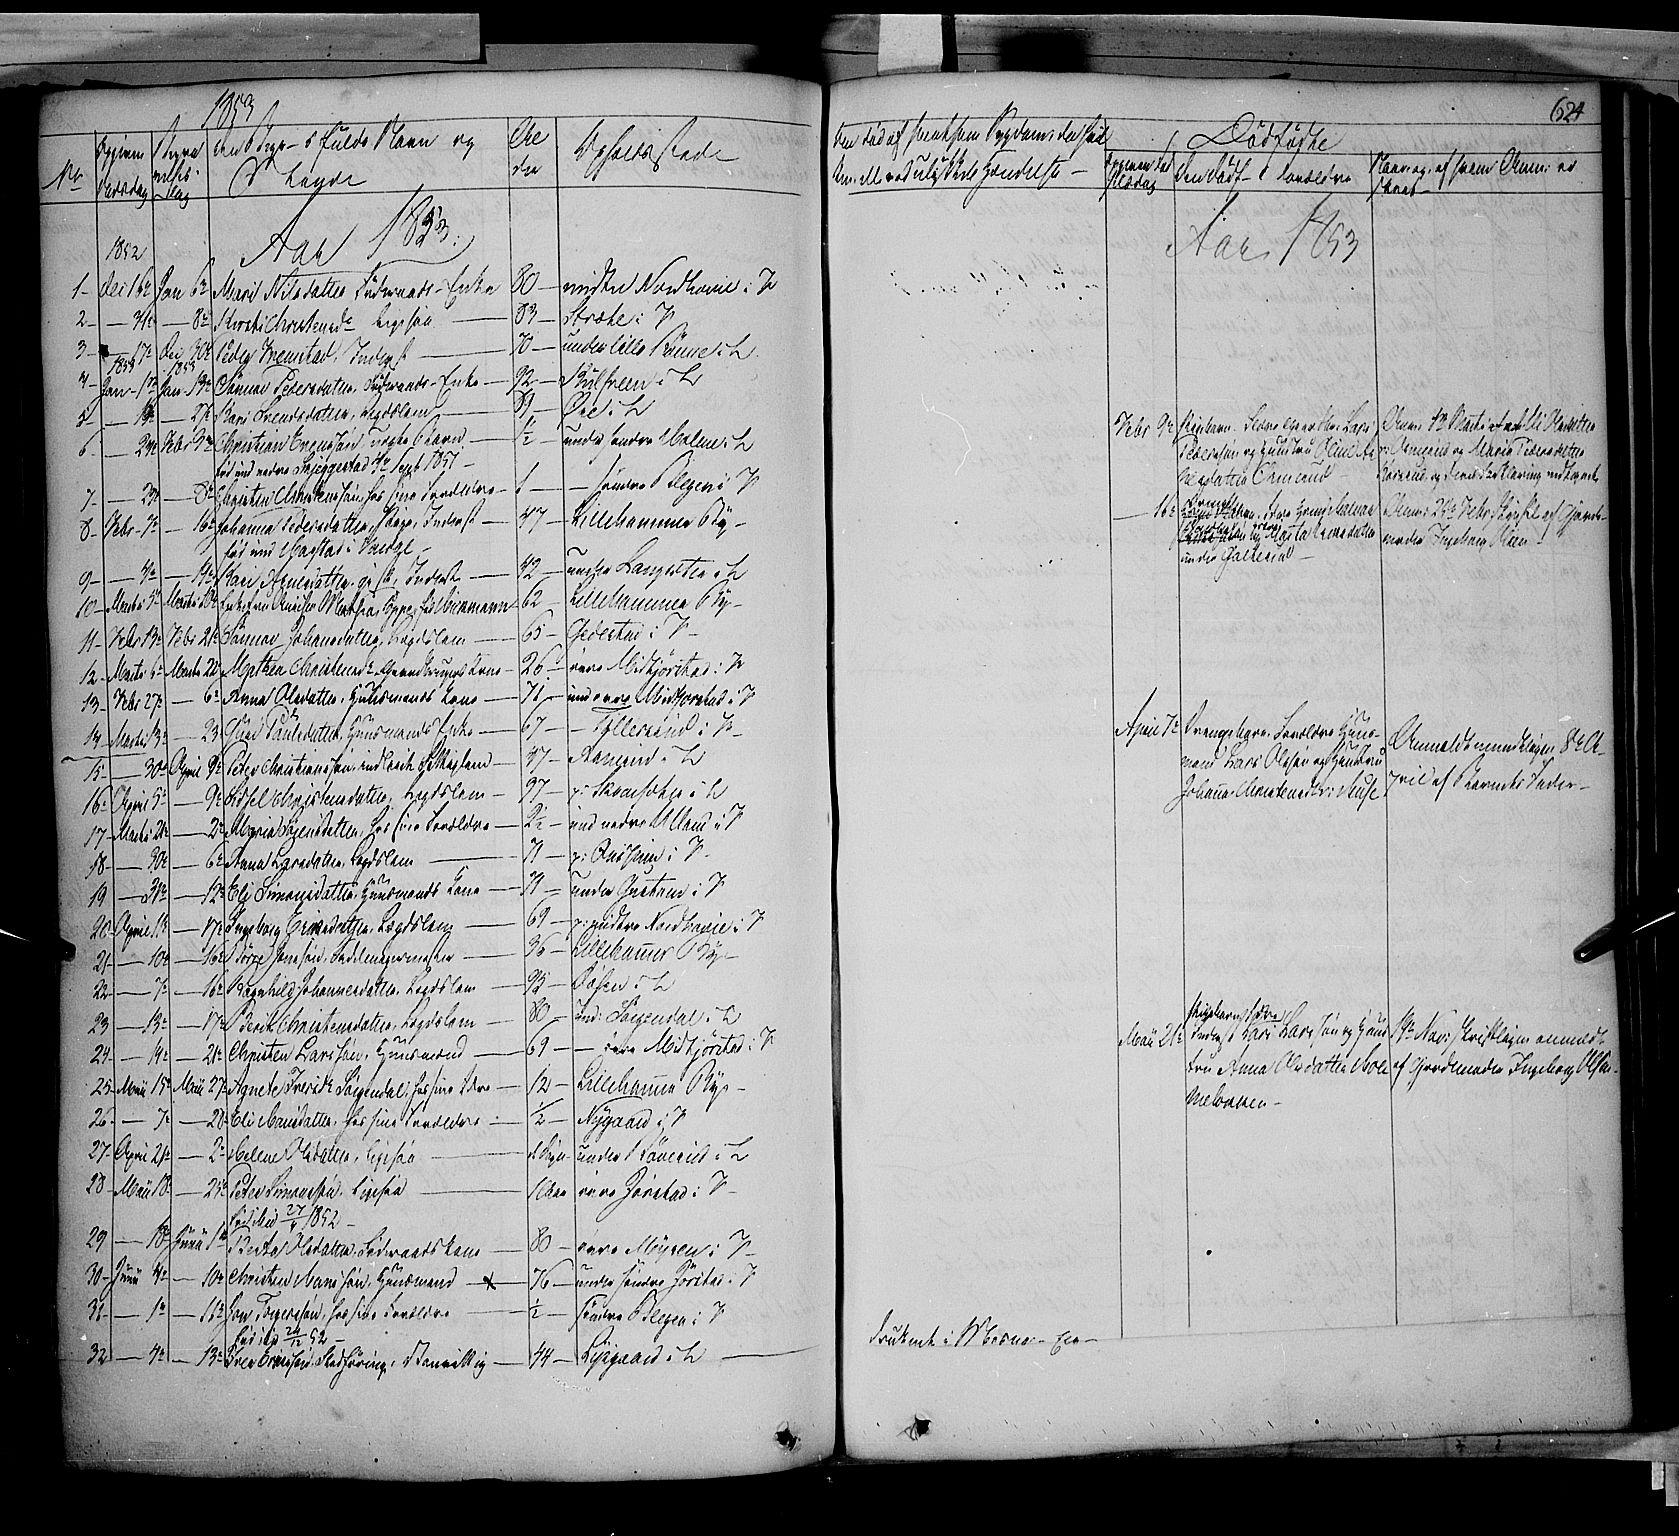 SAH, Fåberg prestekontor, Parish register (official) no. 5, 1836-1854, p. 623-624